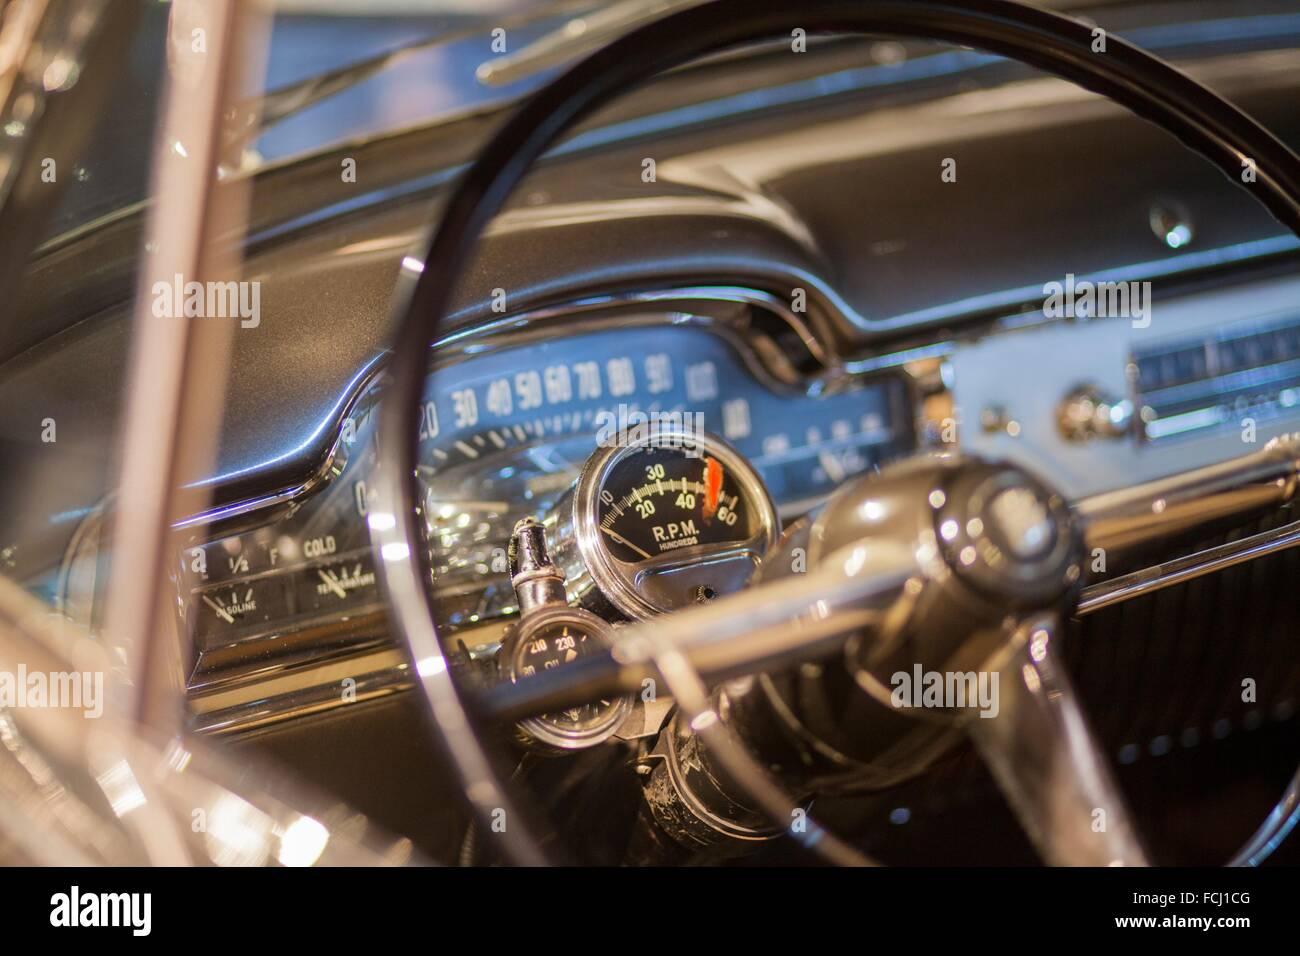 1950 Cadillac dashboard - Stock Image